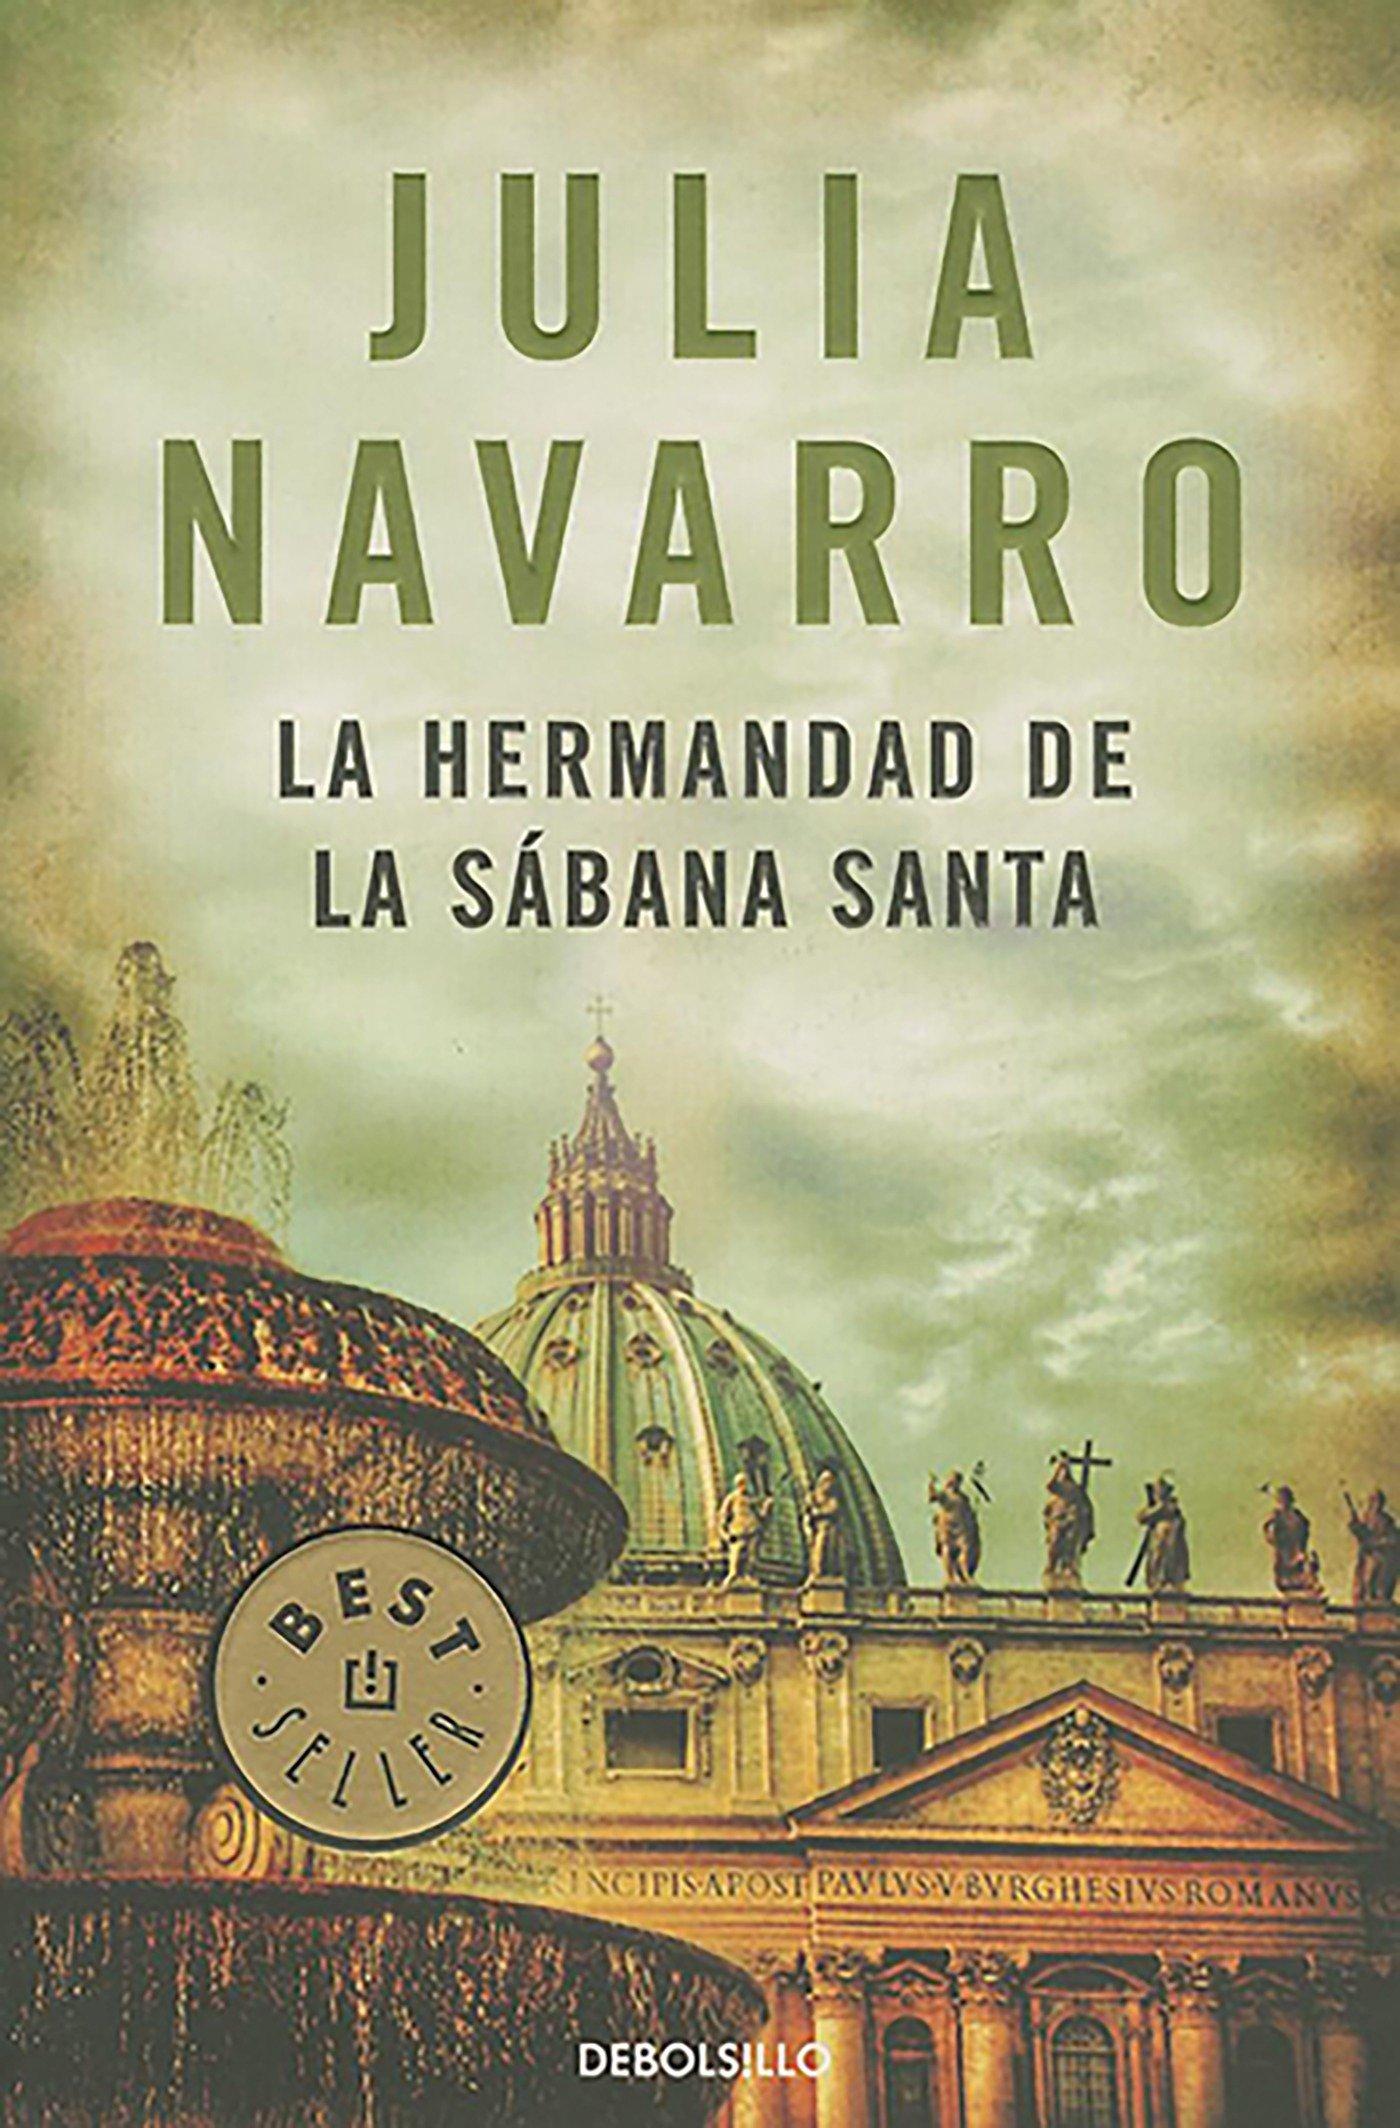 La hermandad de la Sábana Santa (Best Seller): Amazon.es: Navarro, Julia: Libros